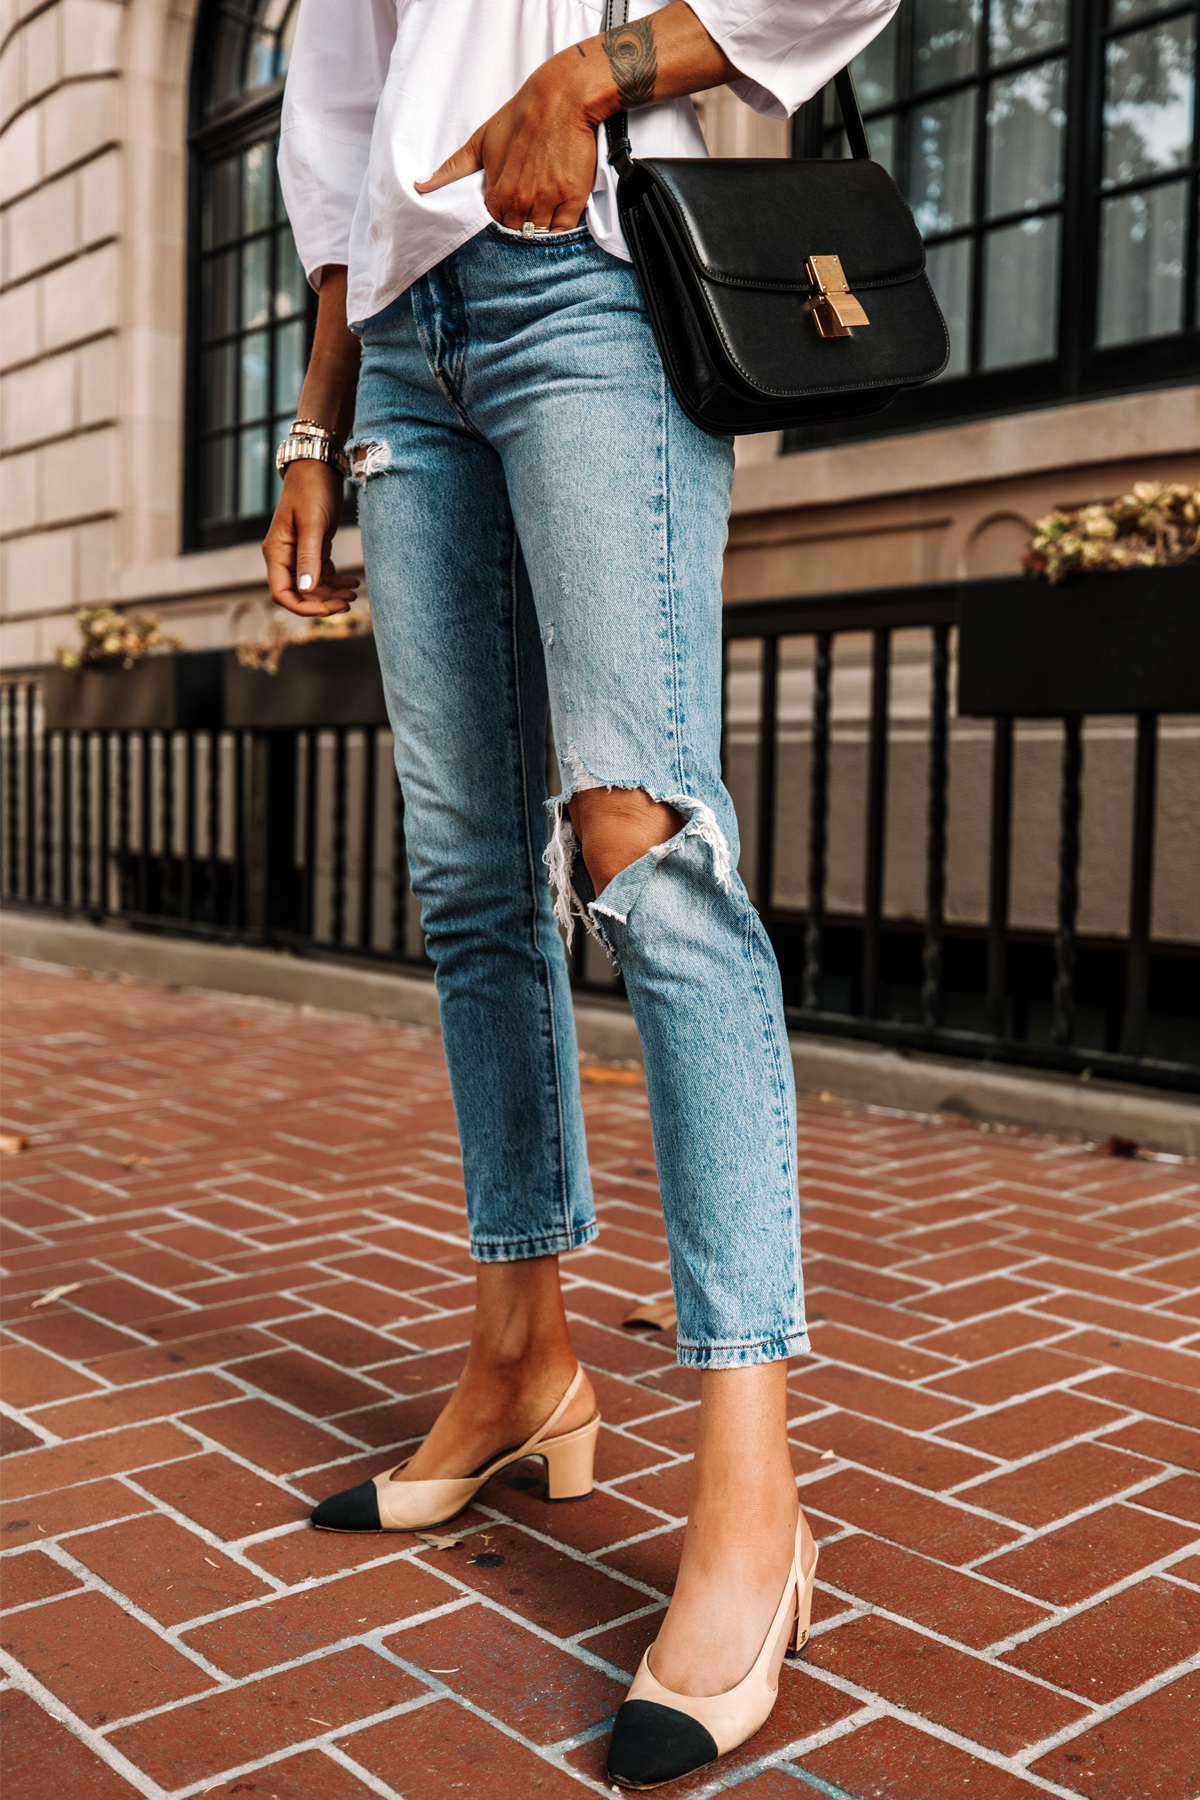 Fashion Jackson Wearing Levis 501 Skinny Ripped Jeans Chanel Slingbacks